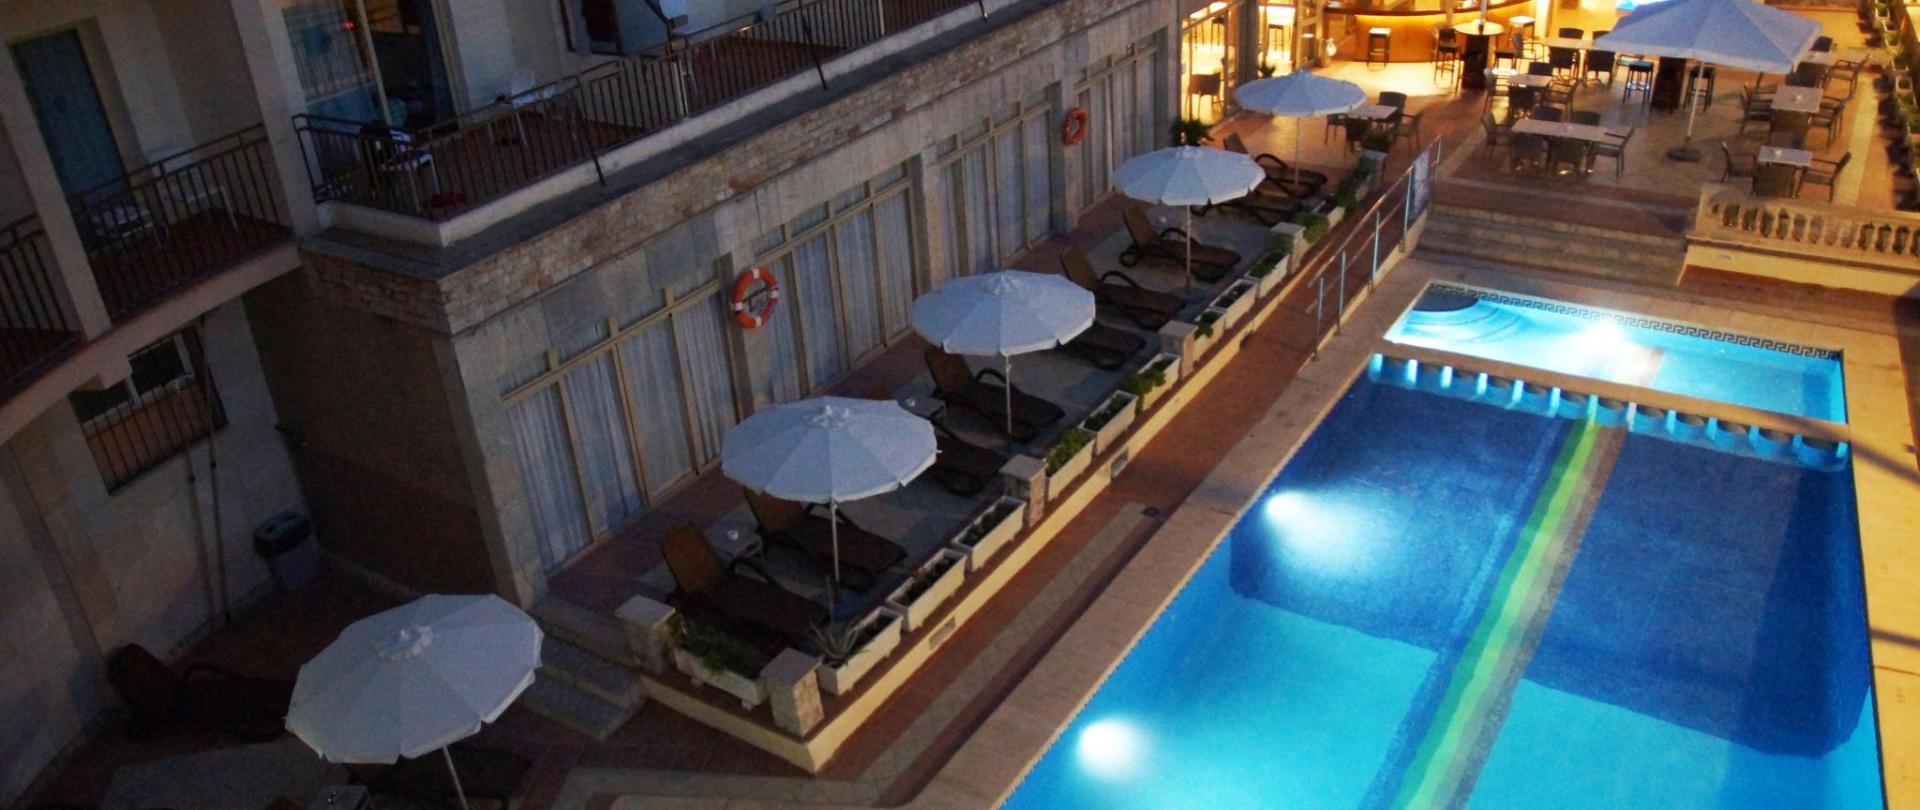 010_hotel_iris_mallorca_10.jpg